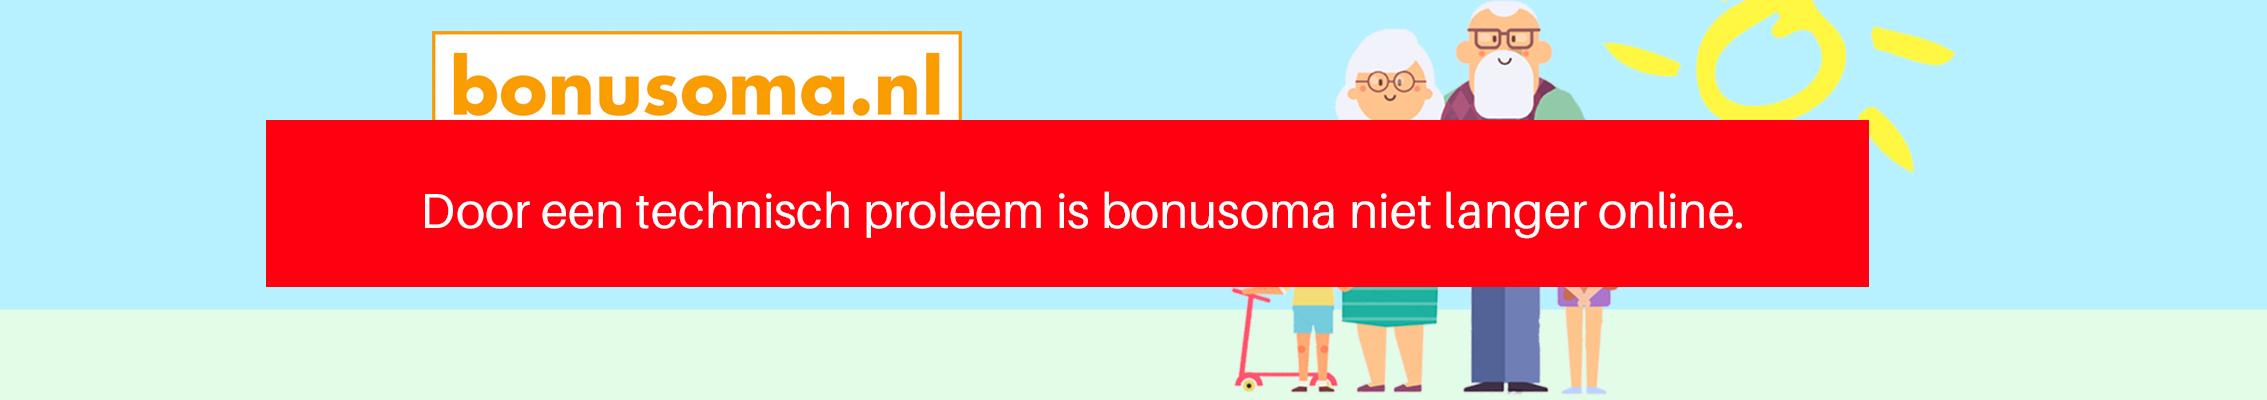 bonsuoma head offline